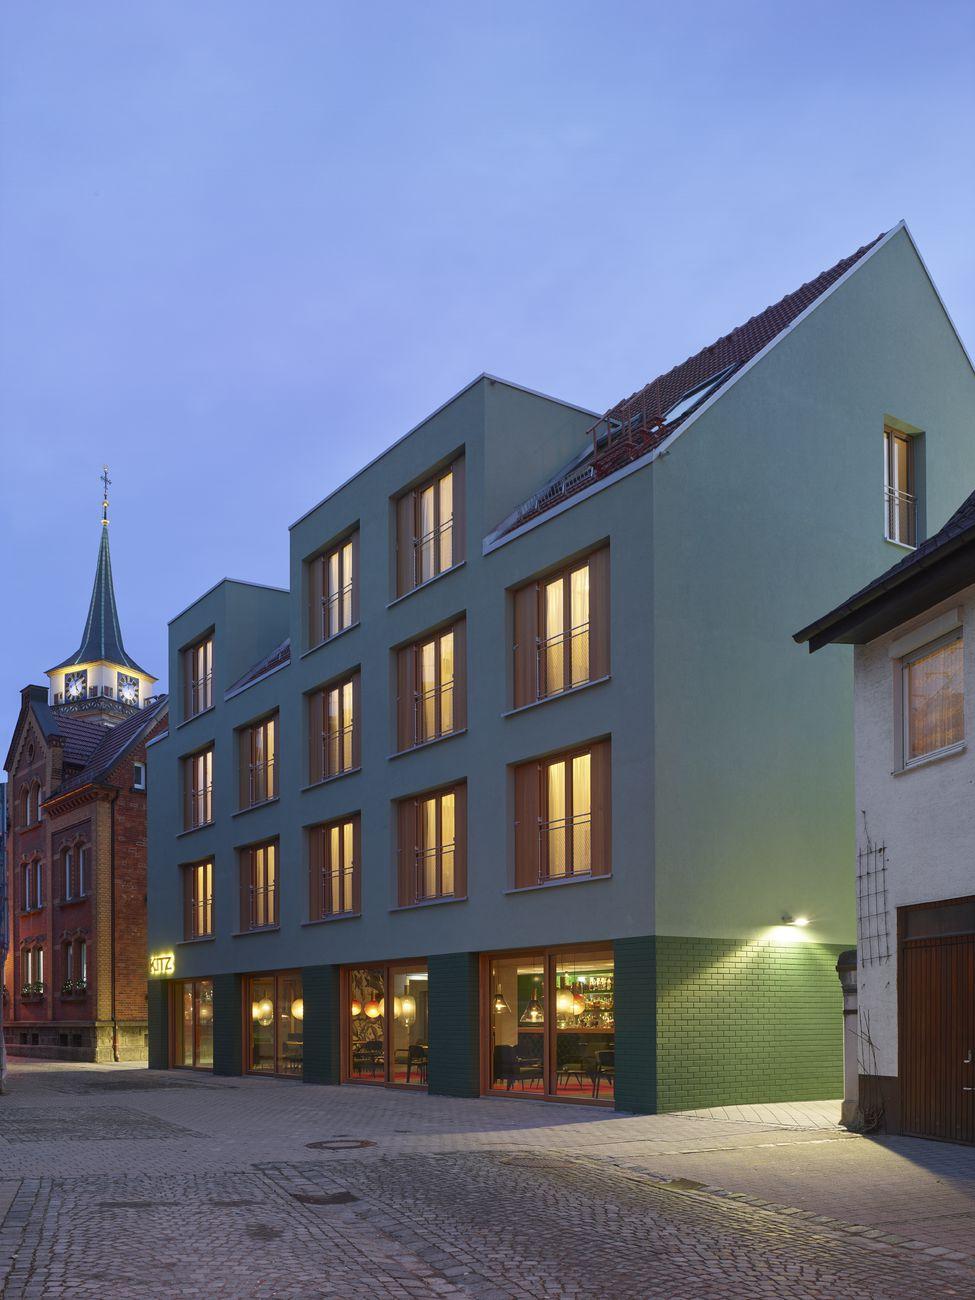 Hotel Kitz, Metzingen, Deutschland